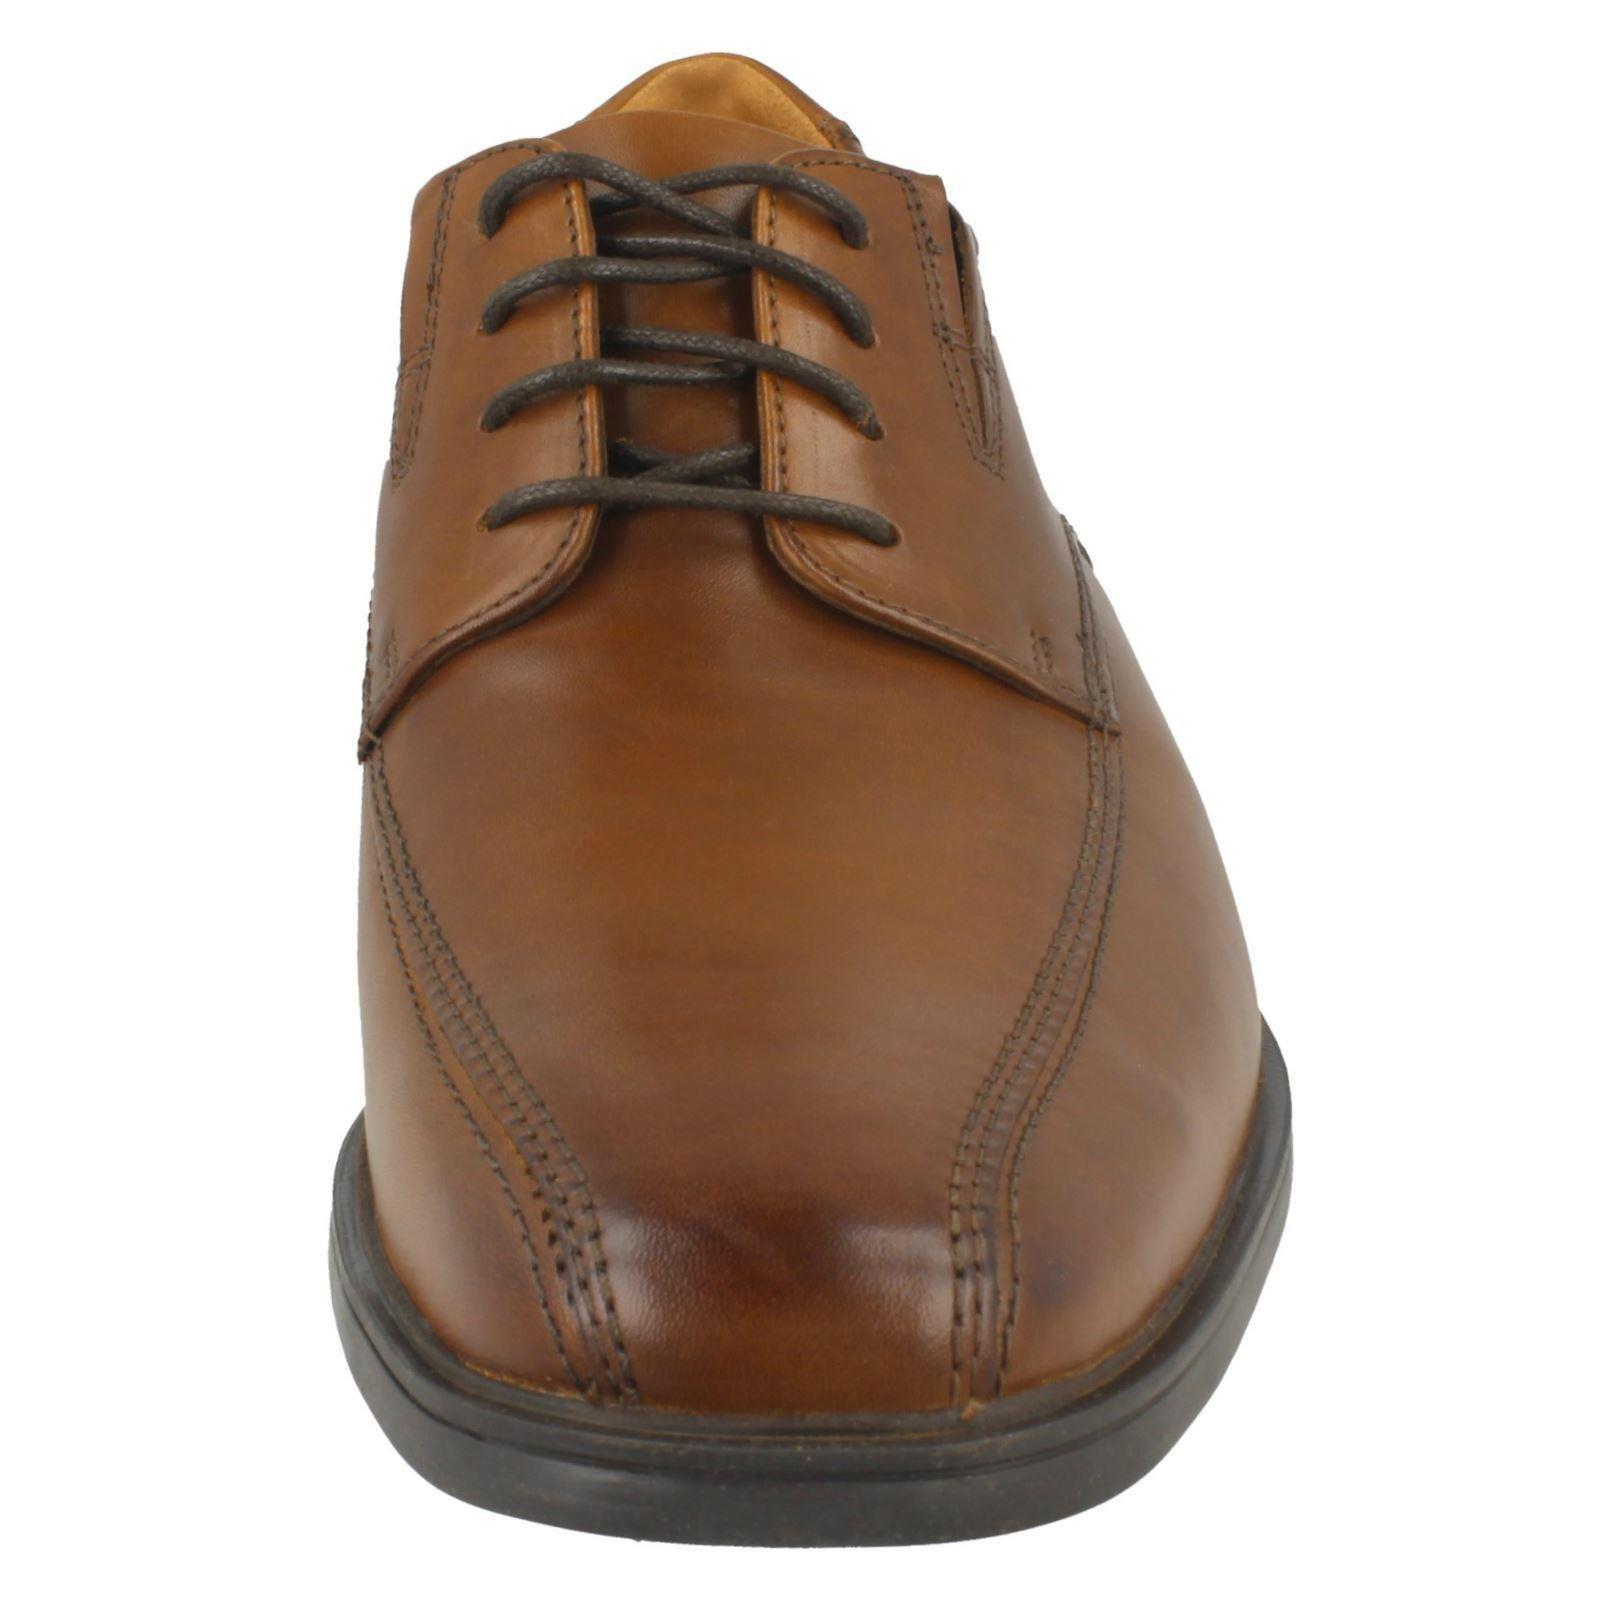 Mens Clarks Clarks Mens Tilden Walk Formal Schuhes 105330